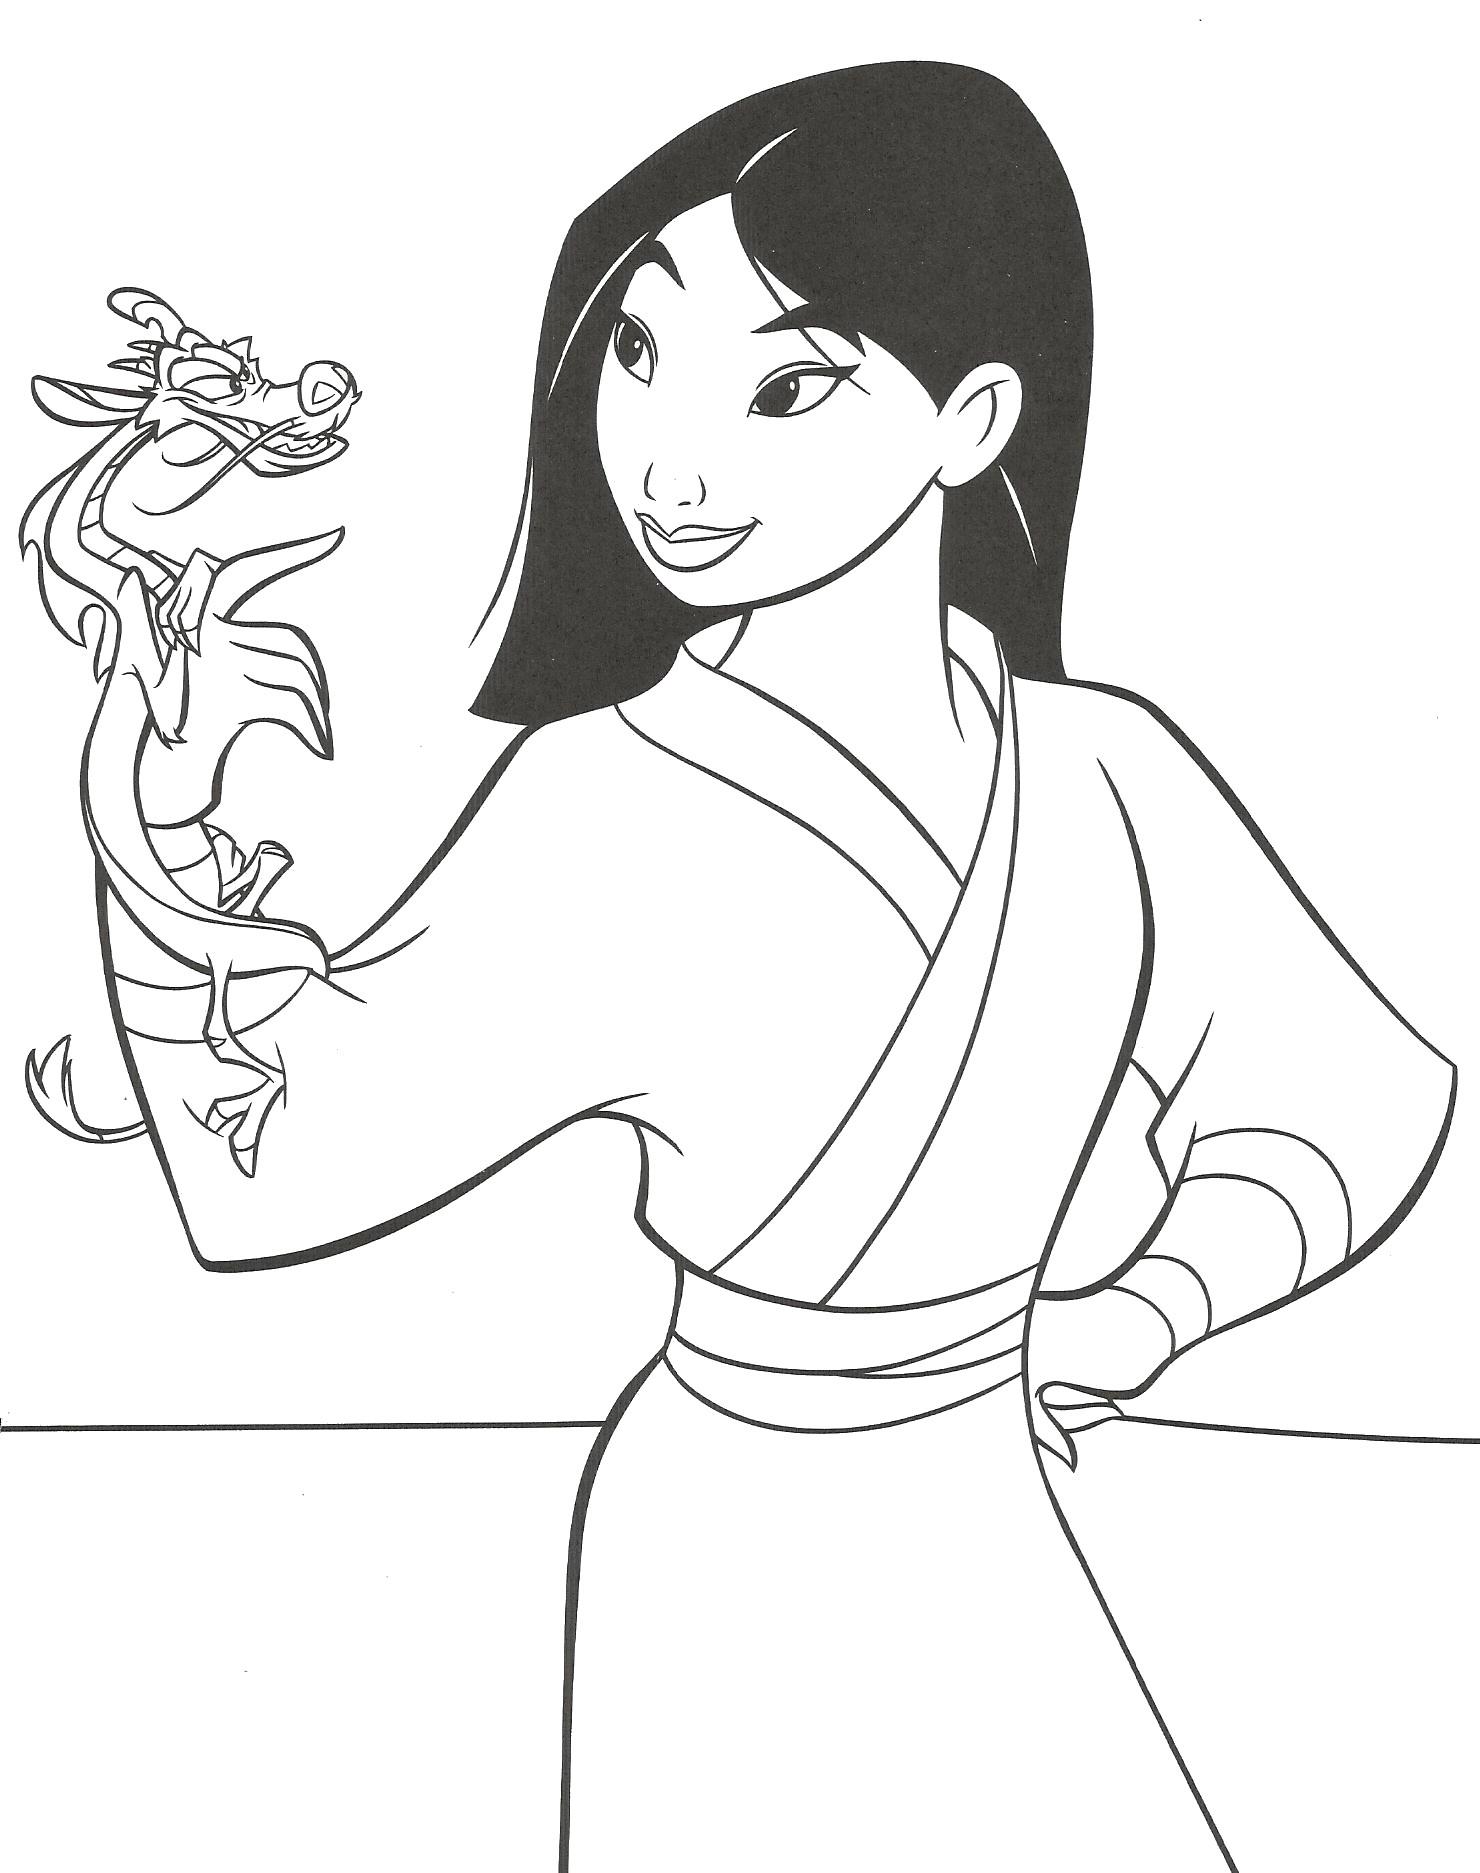 Dessin princesse disney mulan - Dessin a imprimer disney gratuit ...